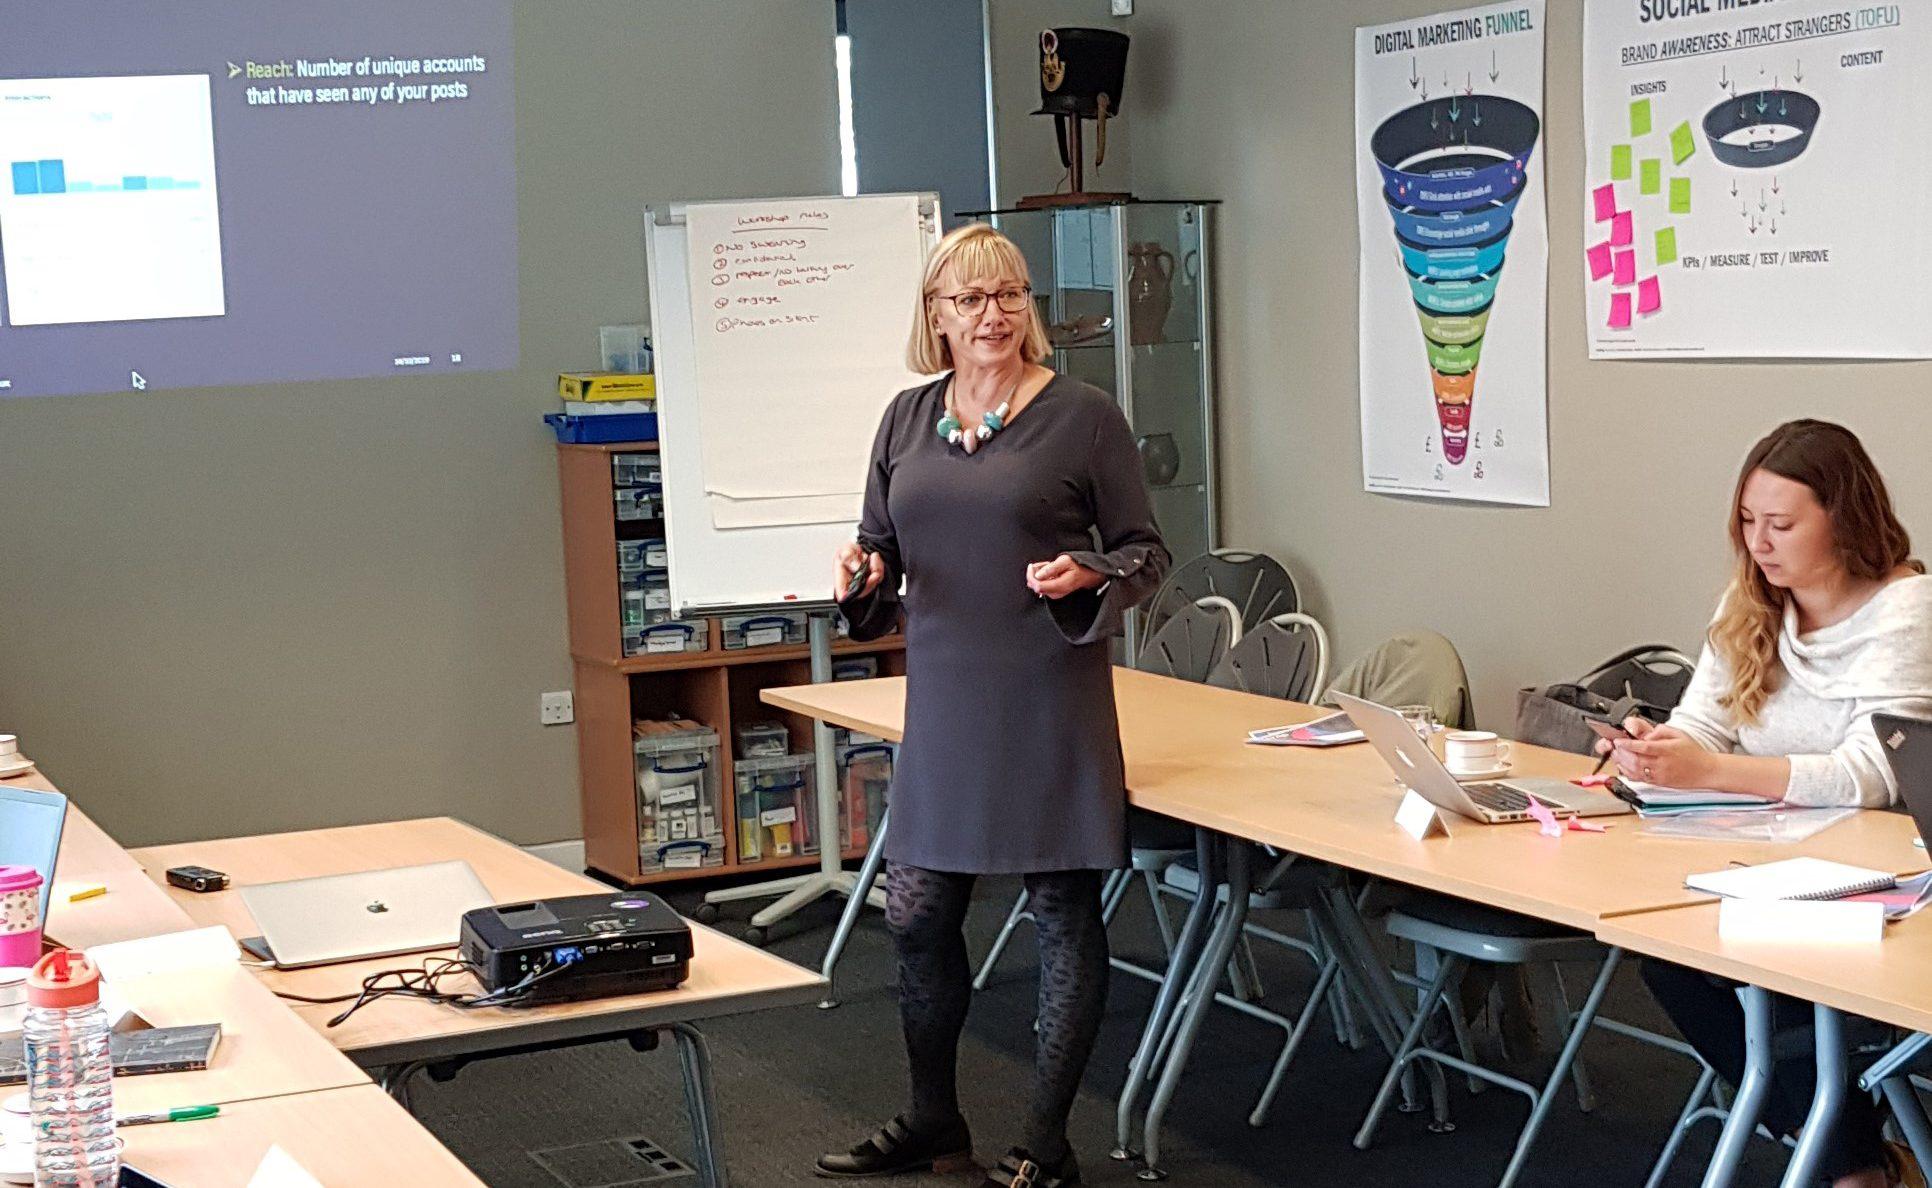 Teaching social media for Chichester District Council - four part workshop